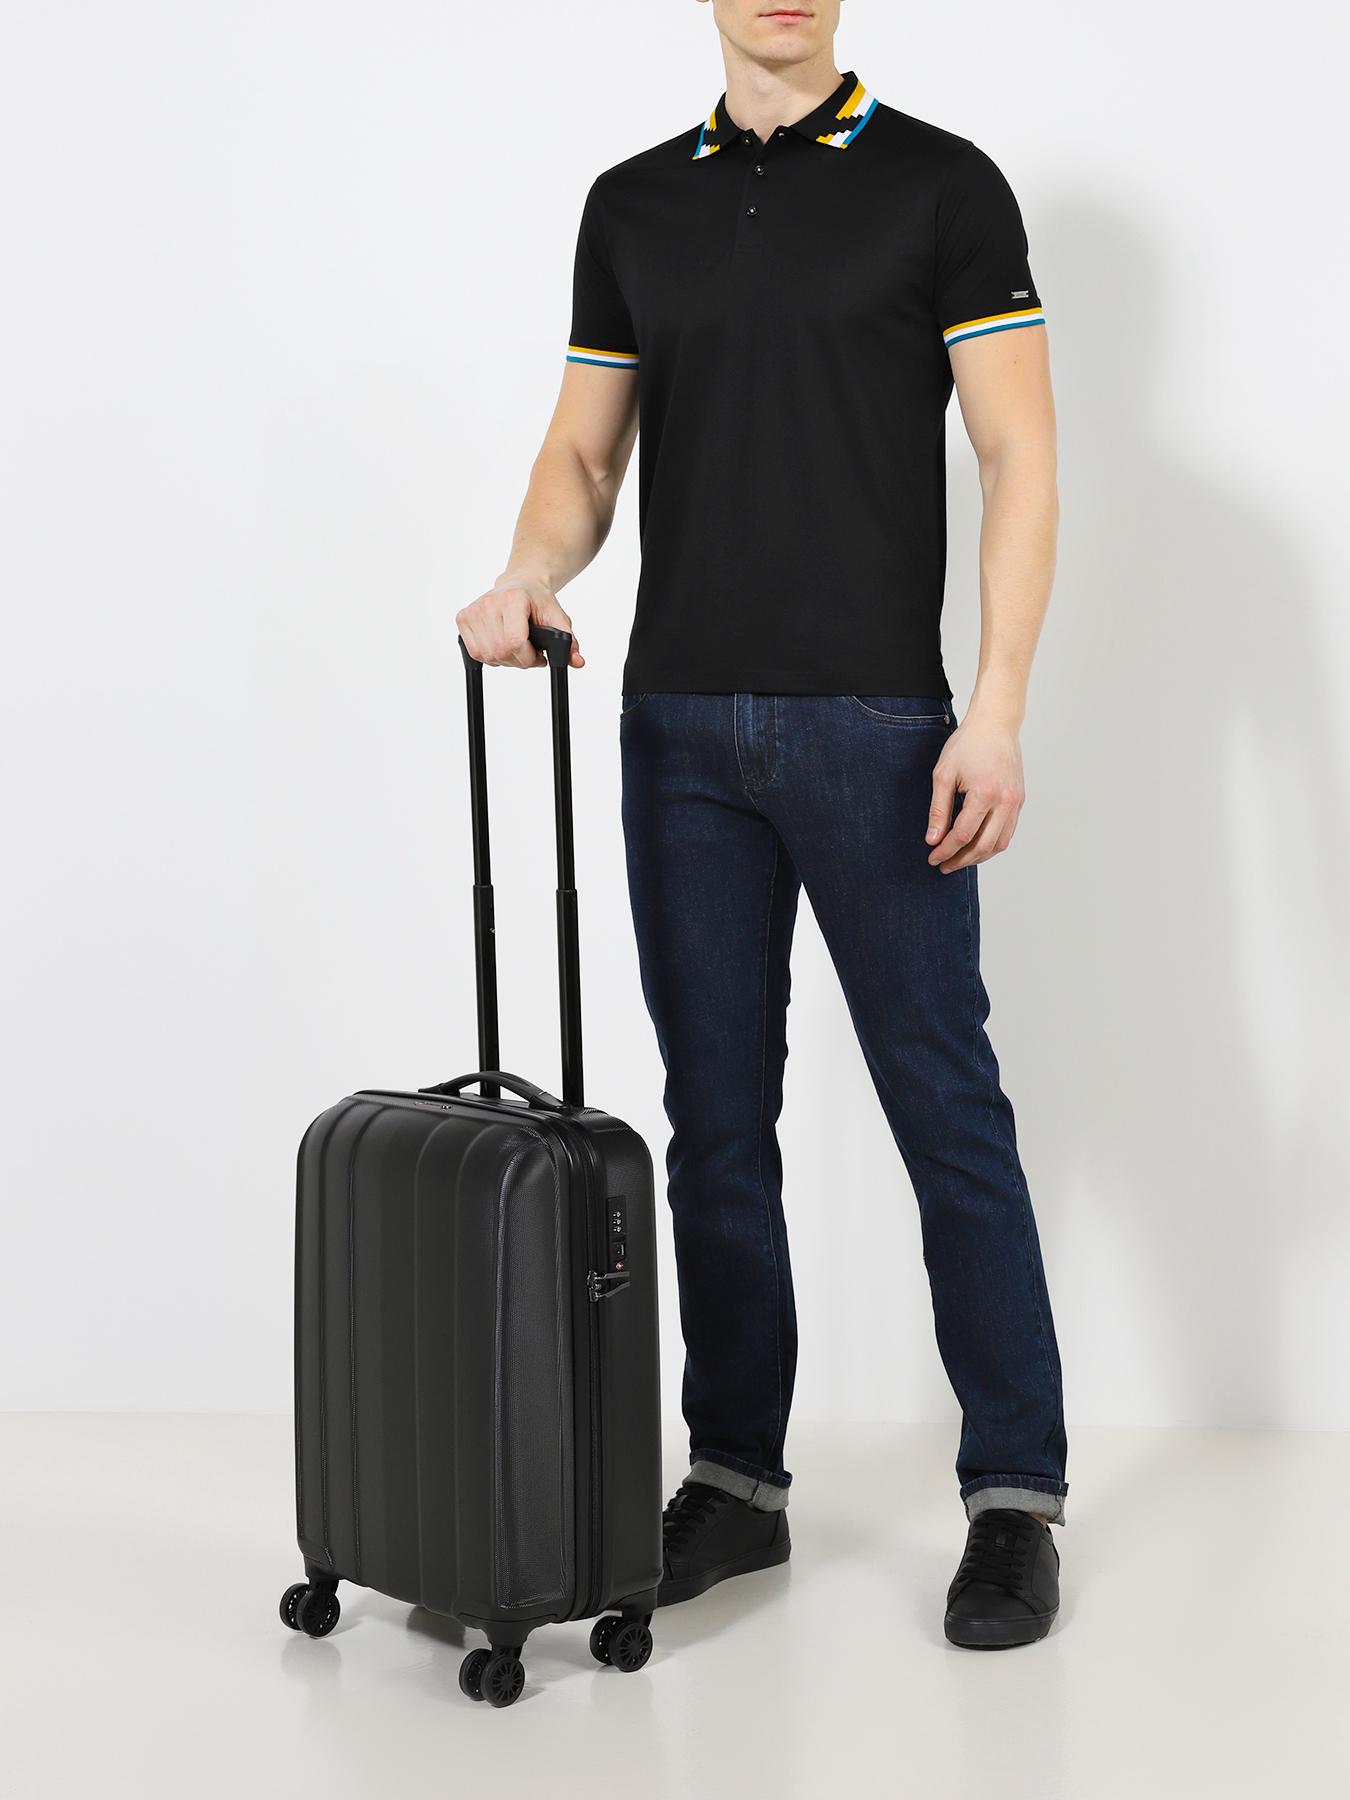 Чемодан Ritter Чемодан RR 20 чемодан ritter чемодан rc 20